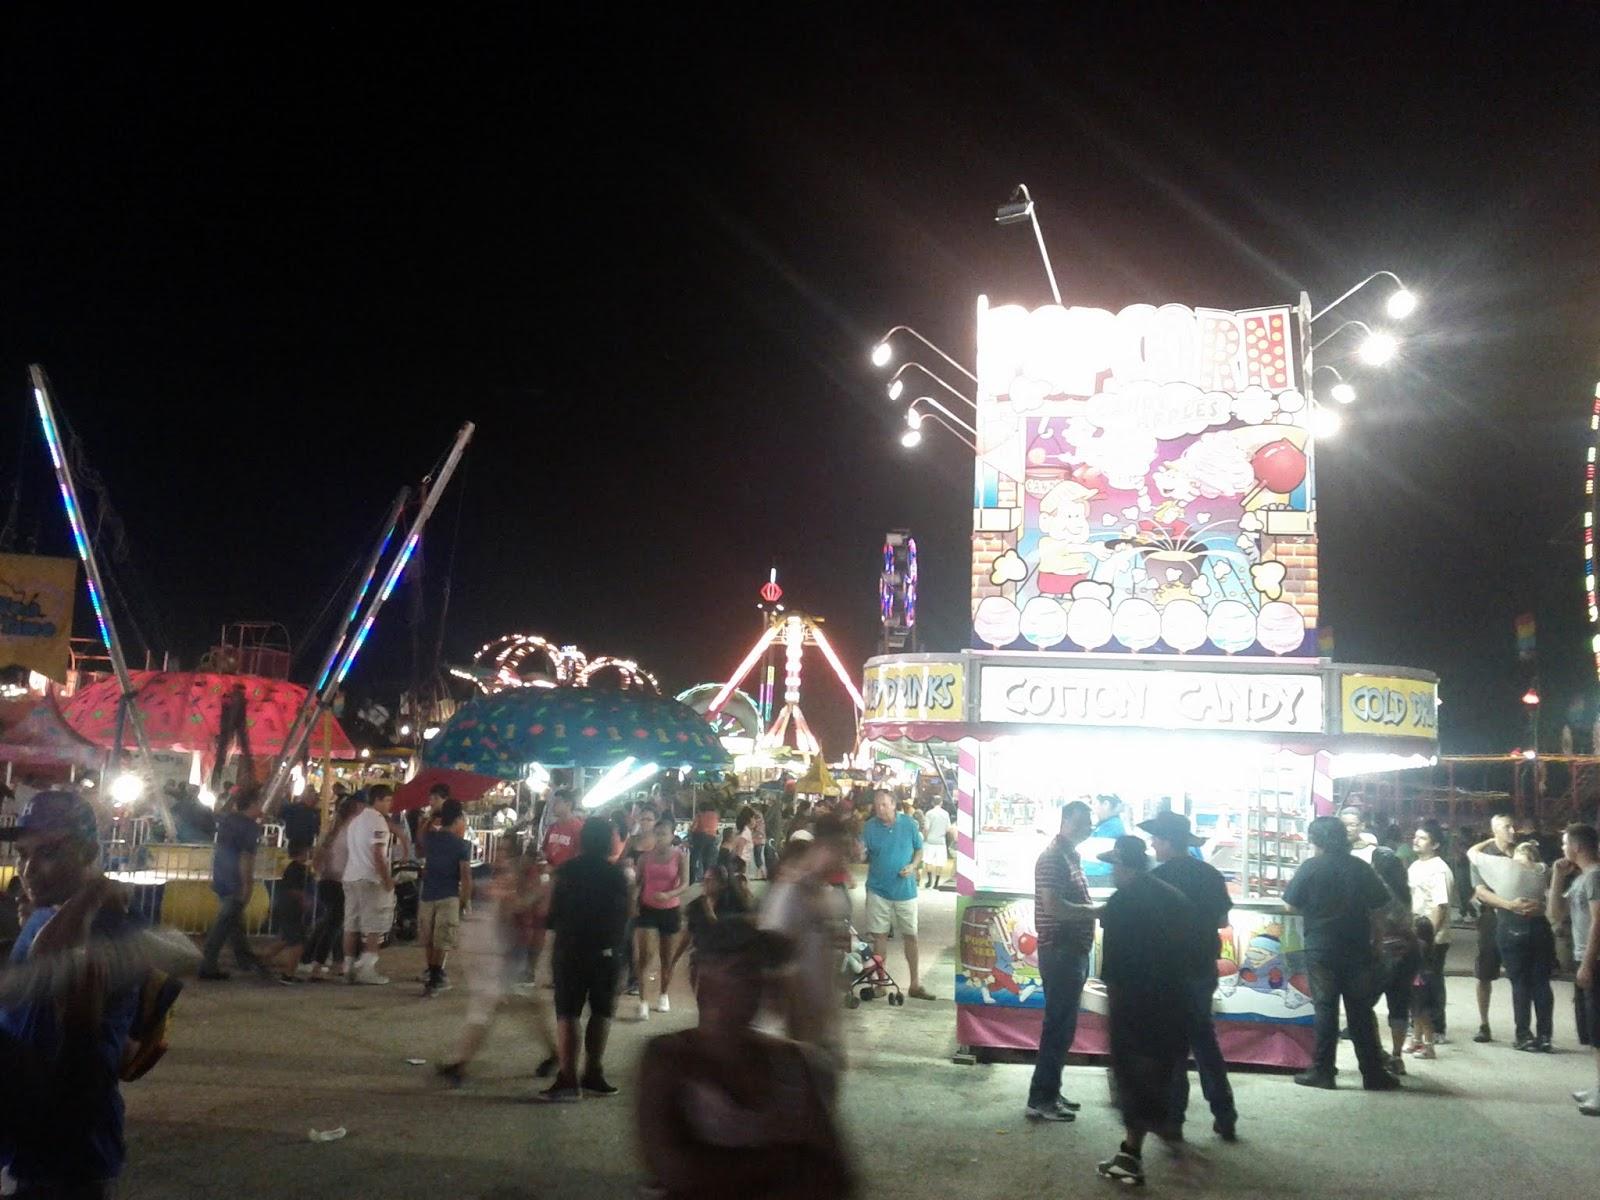 Fort Bend County Fair 2012 - IMG_20121006_202238.jpg